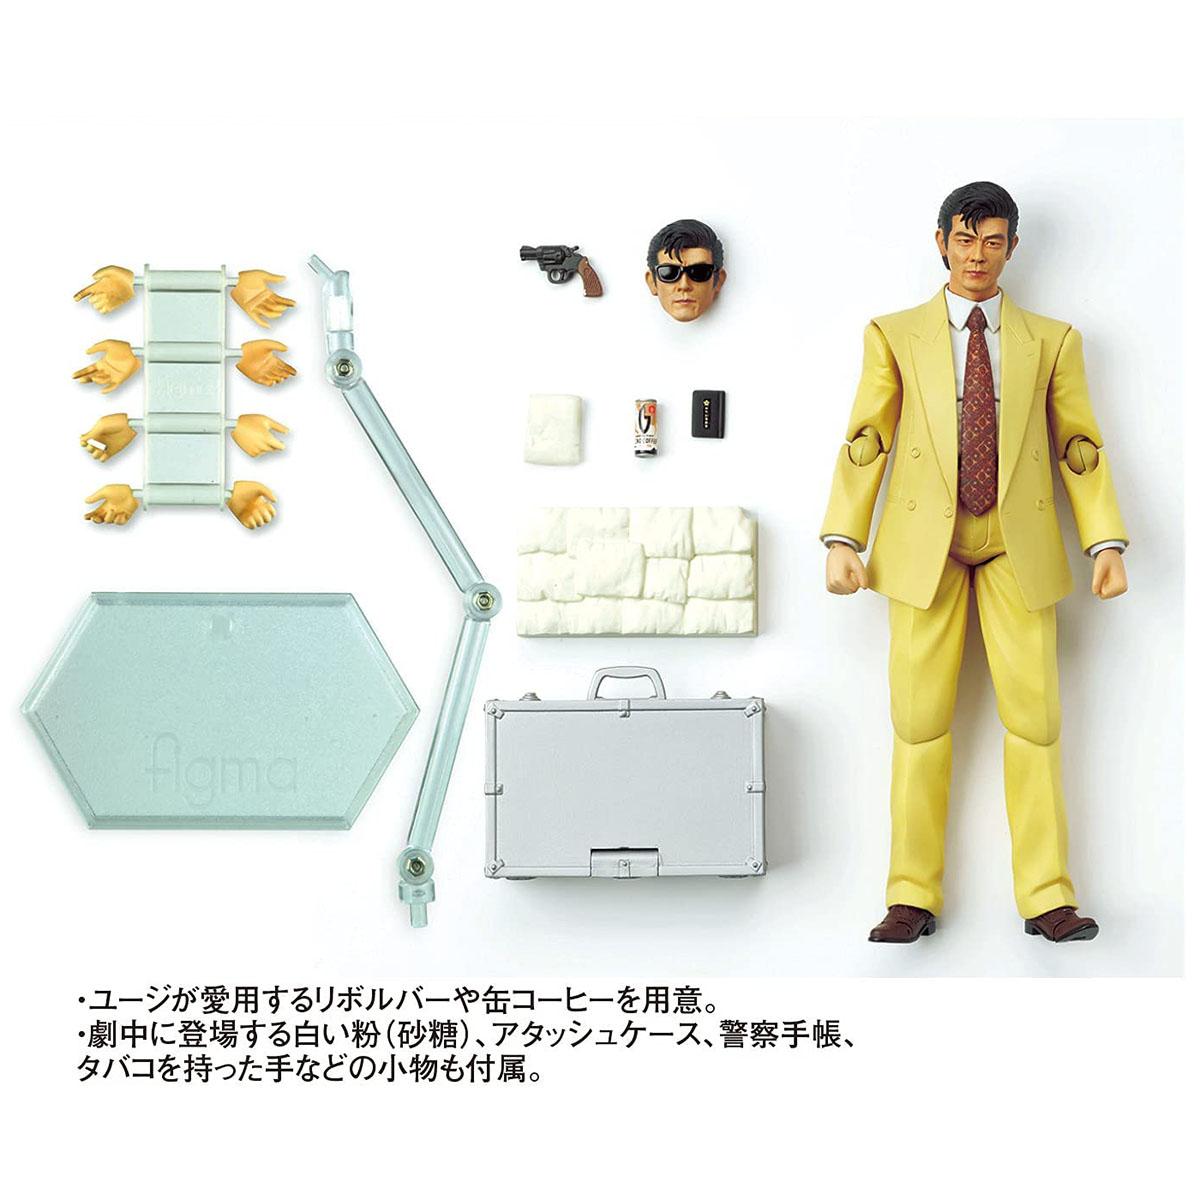 【DB】あぶない刑事 Blu-ray BOX VOL,1『タカフィギュア付き』完全予約限定生産-020